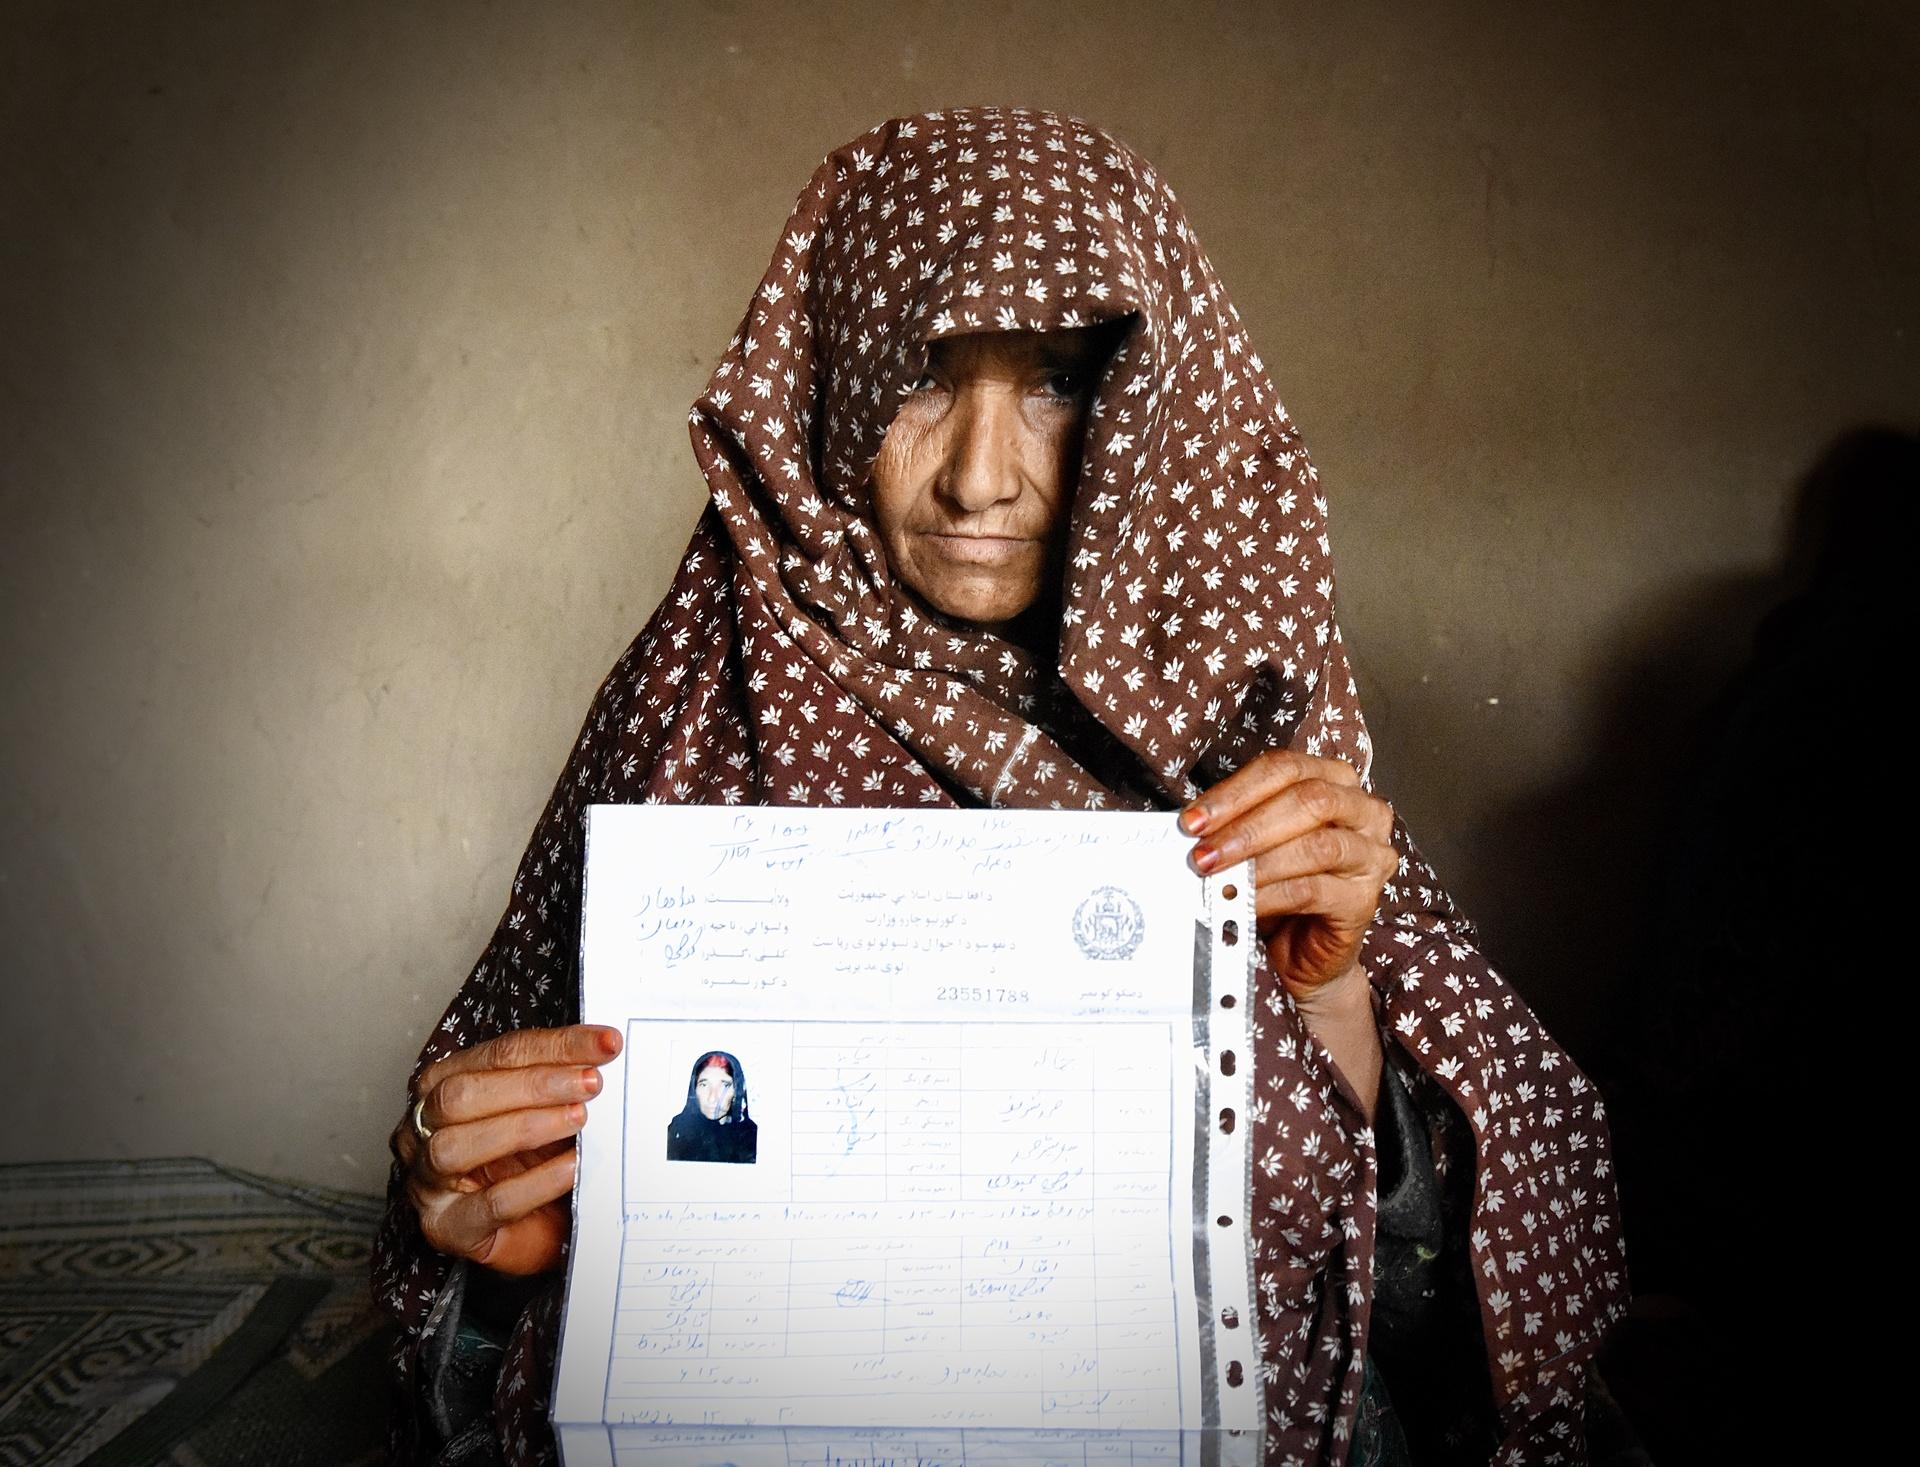 (c) Becky Bakr Abdulla/NRC